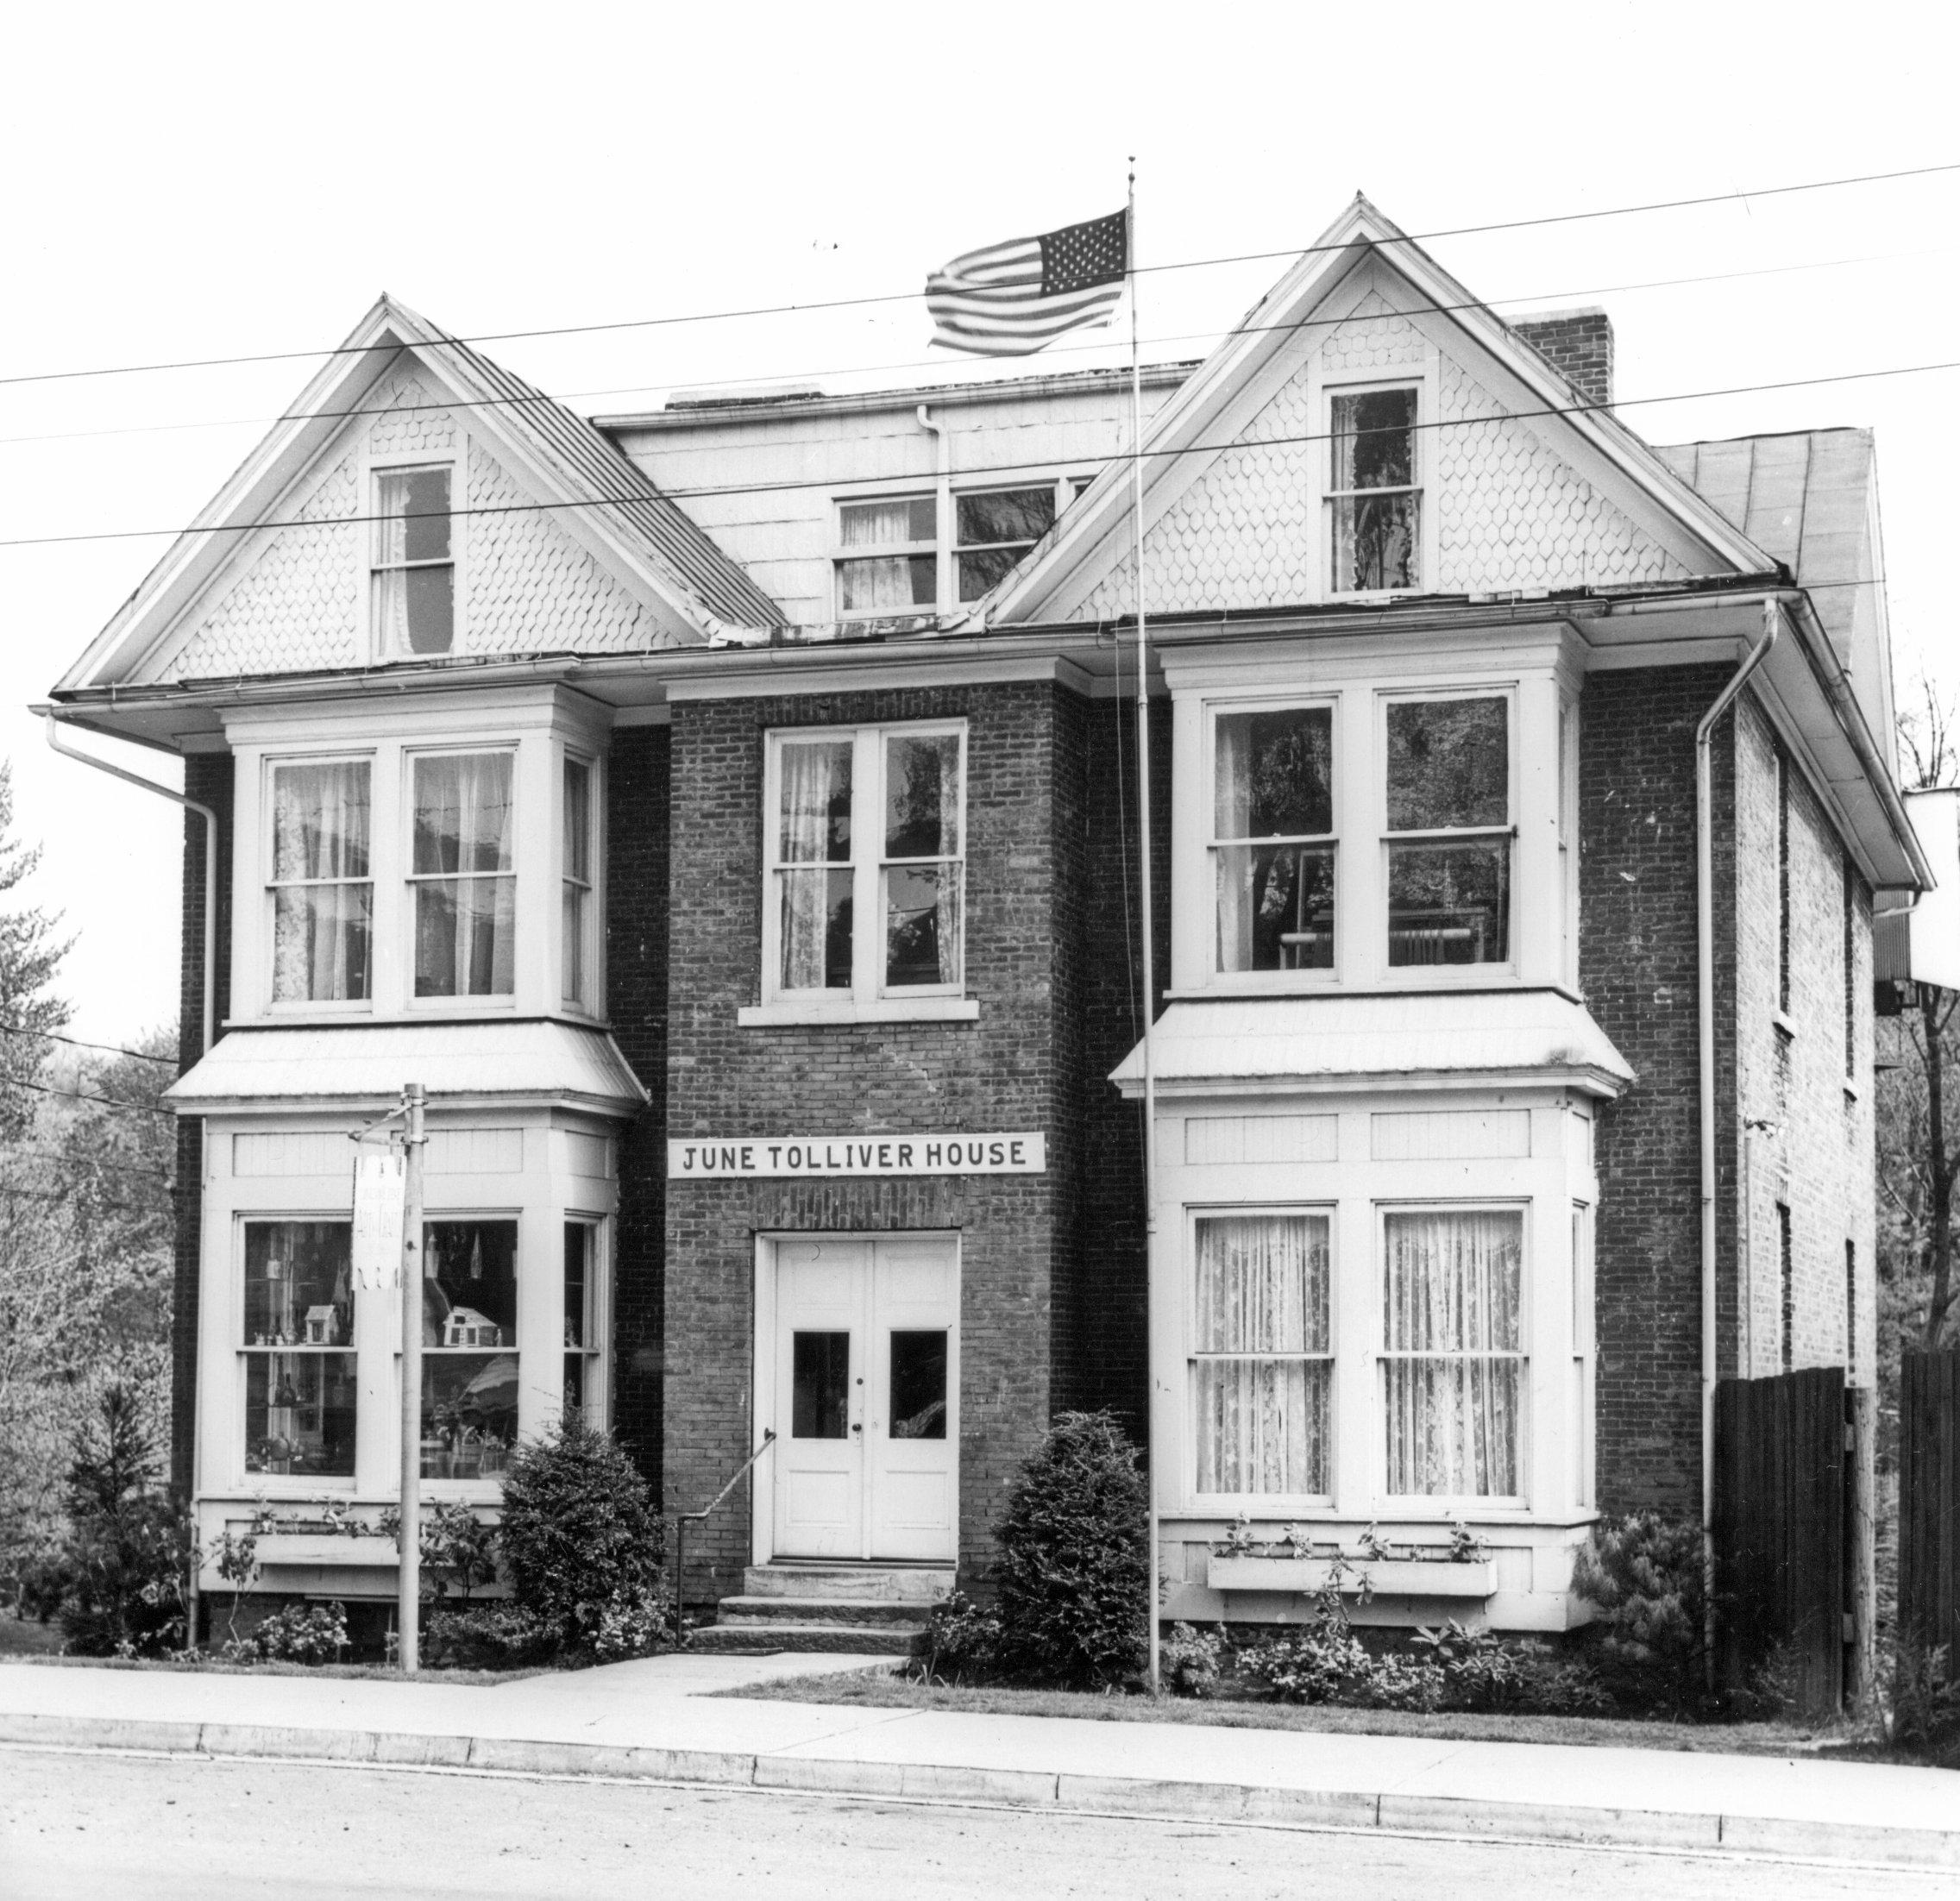 June Tolliver House